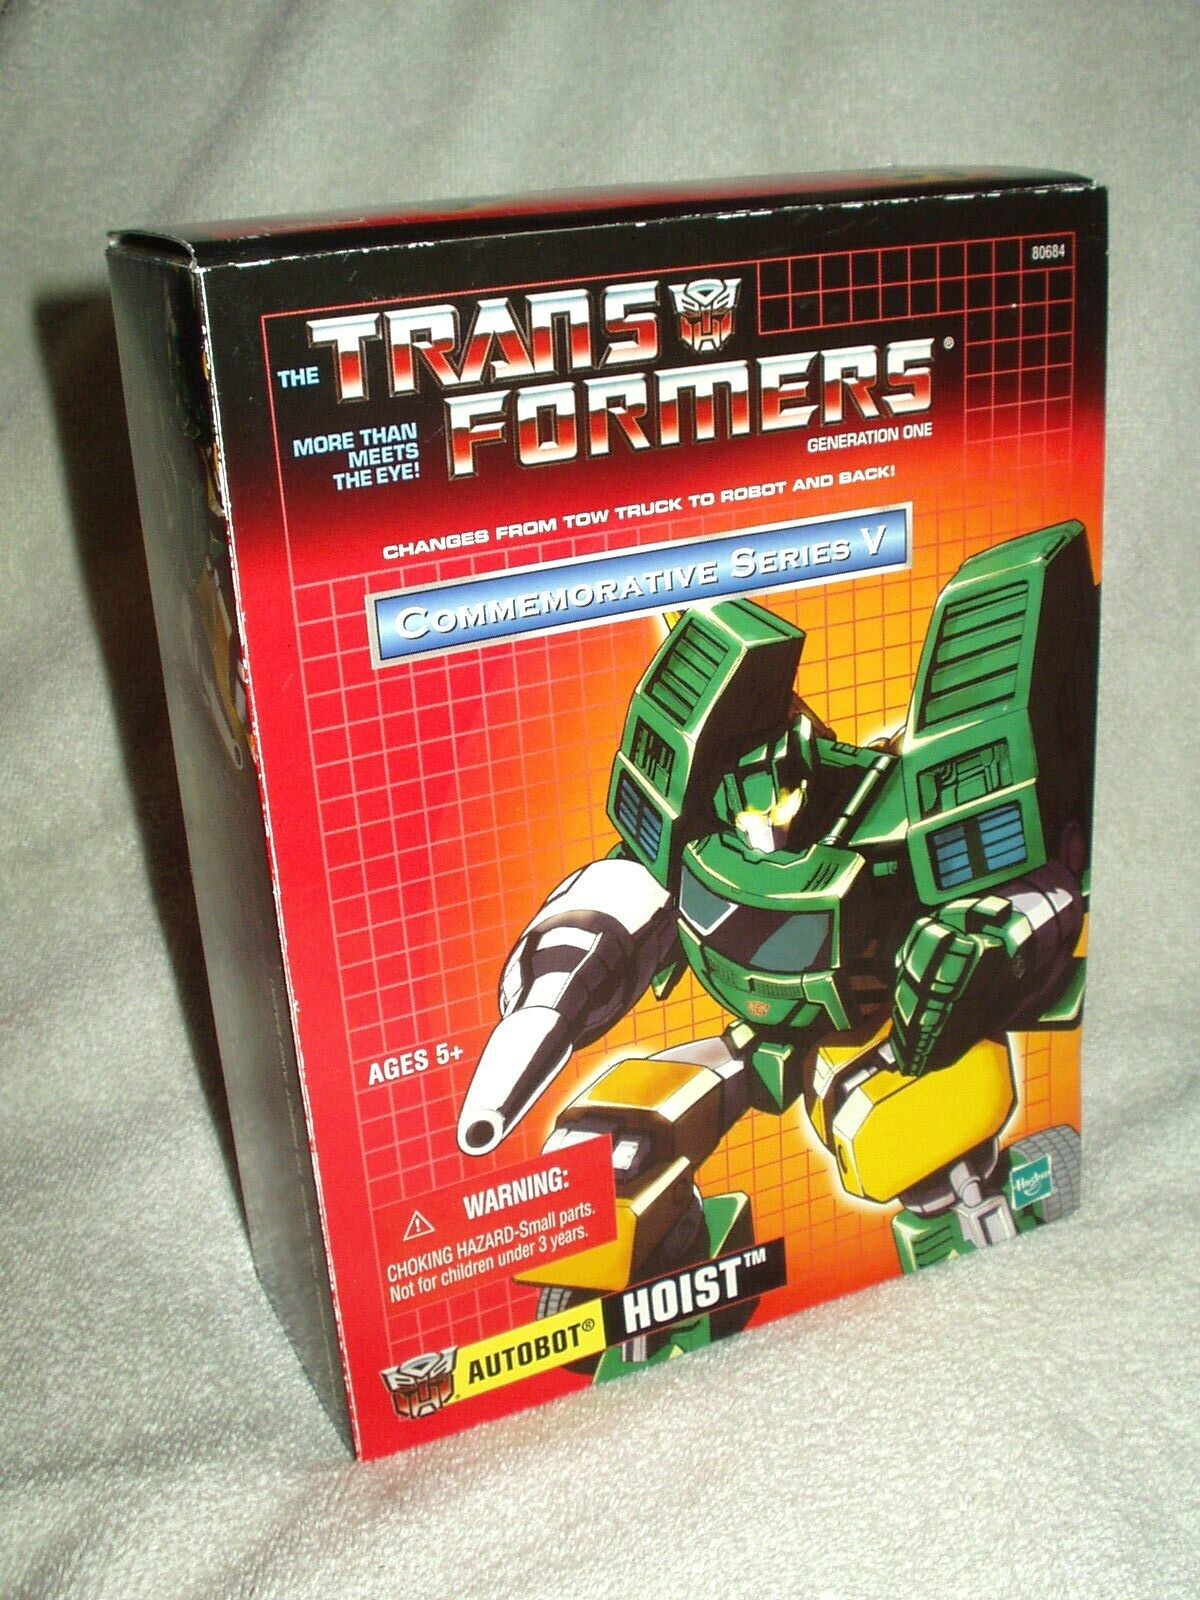 Transformers Action Figure Takara Reissue Commemorative Series V Hoist